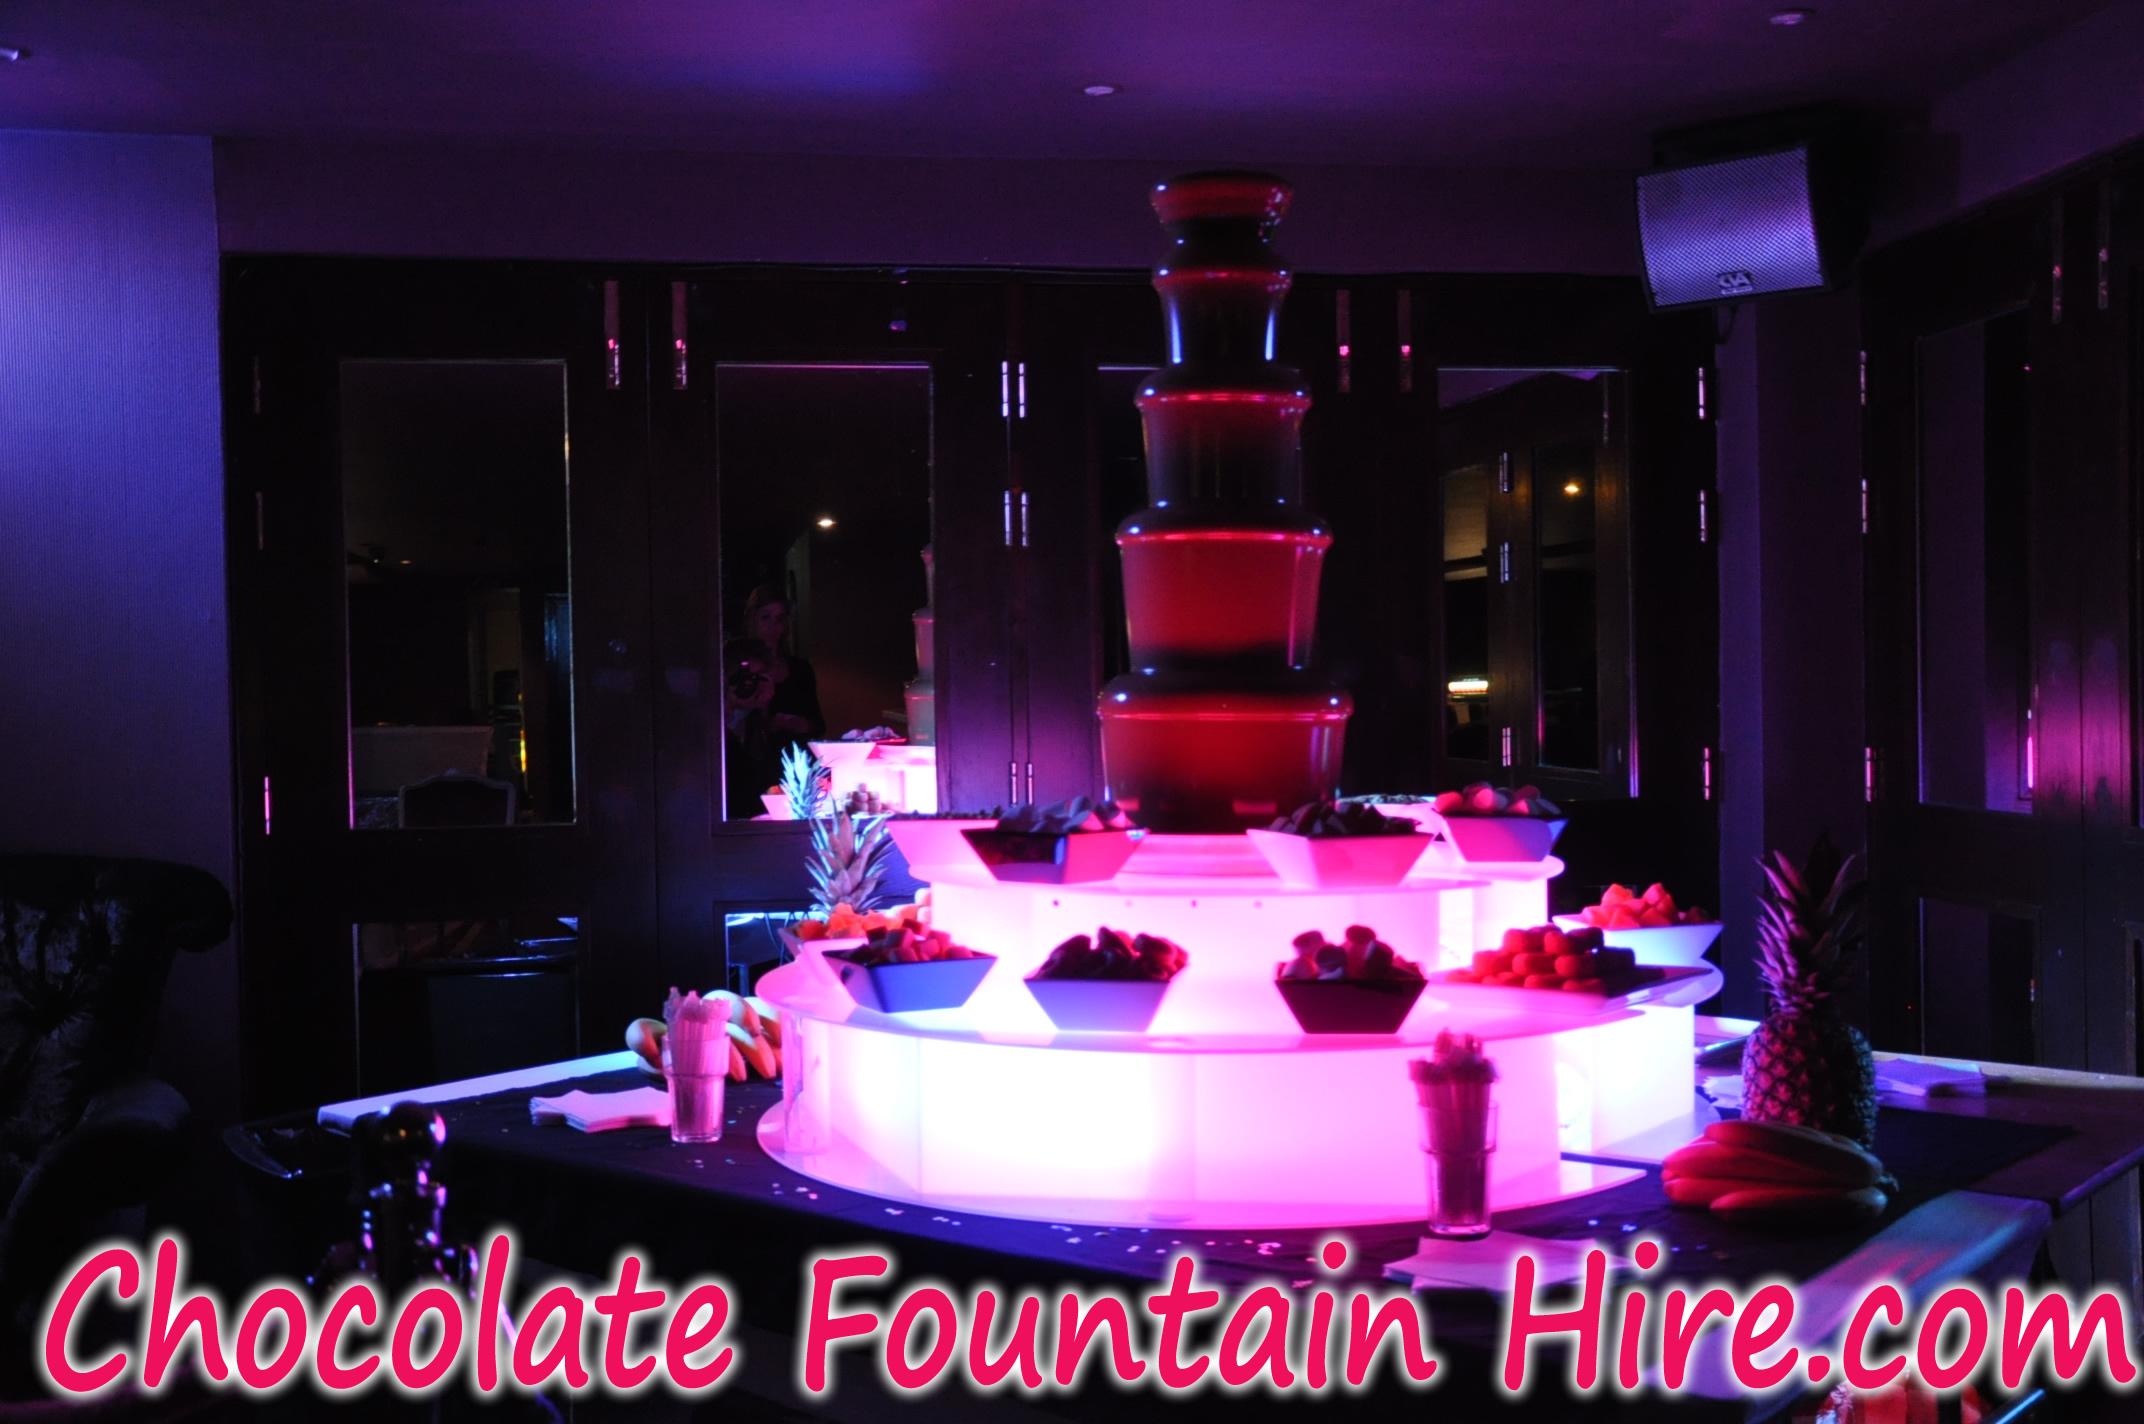 Chocolate Fountain Hire Southampton : Chocolate Fountain Hire